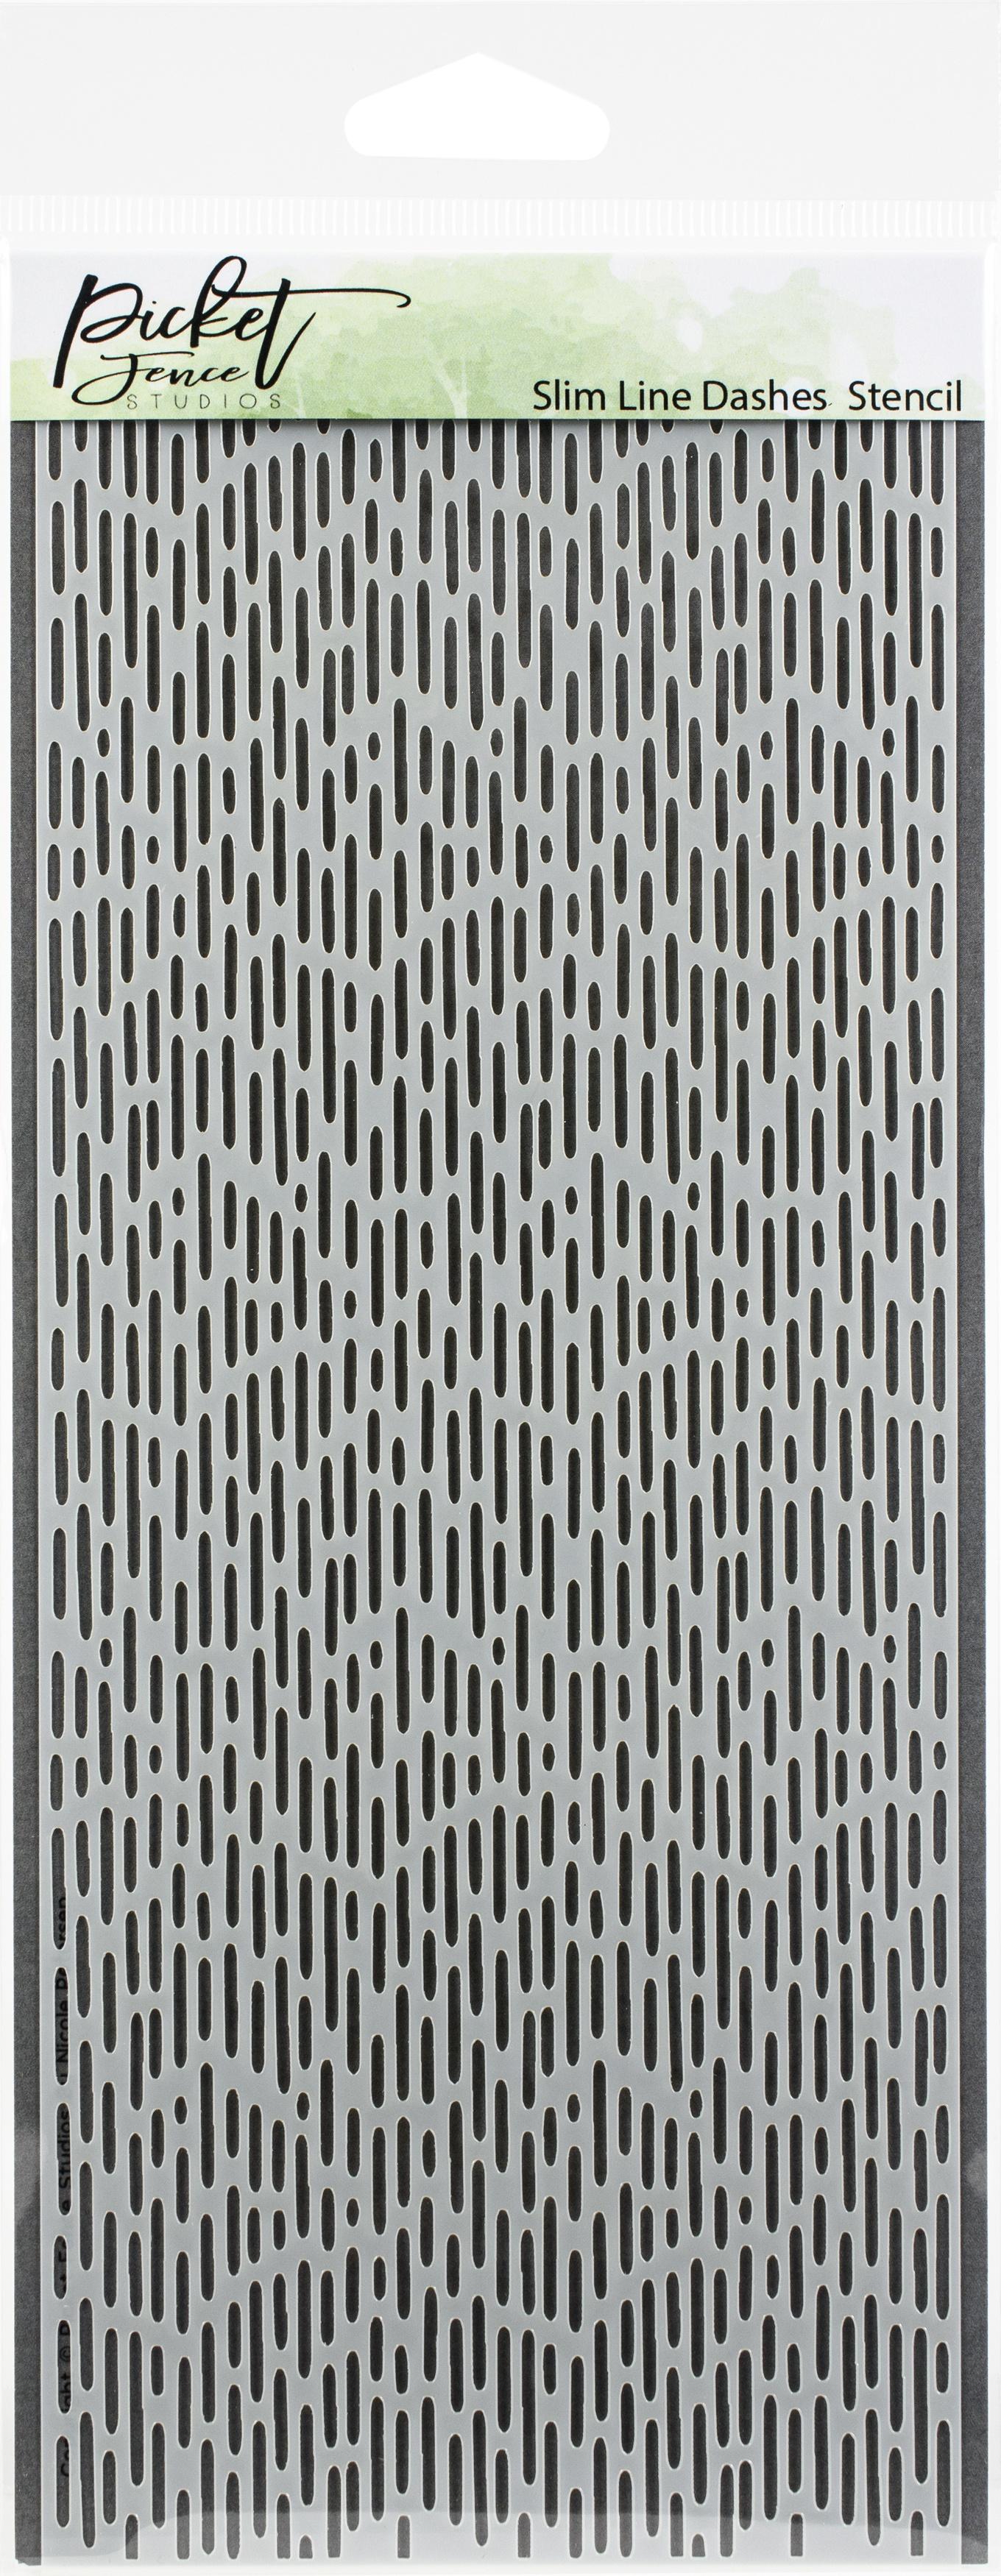 Picket Fence Studios Stencil 4X8-Slim Line Dashes